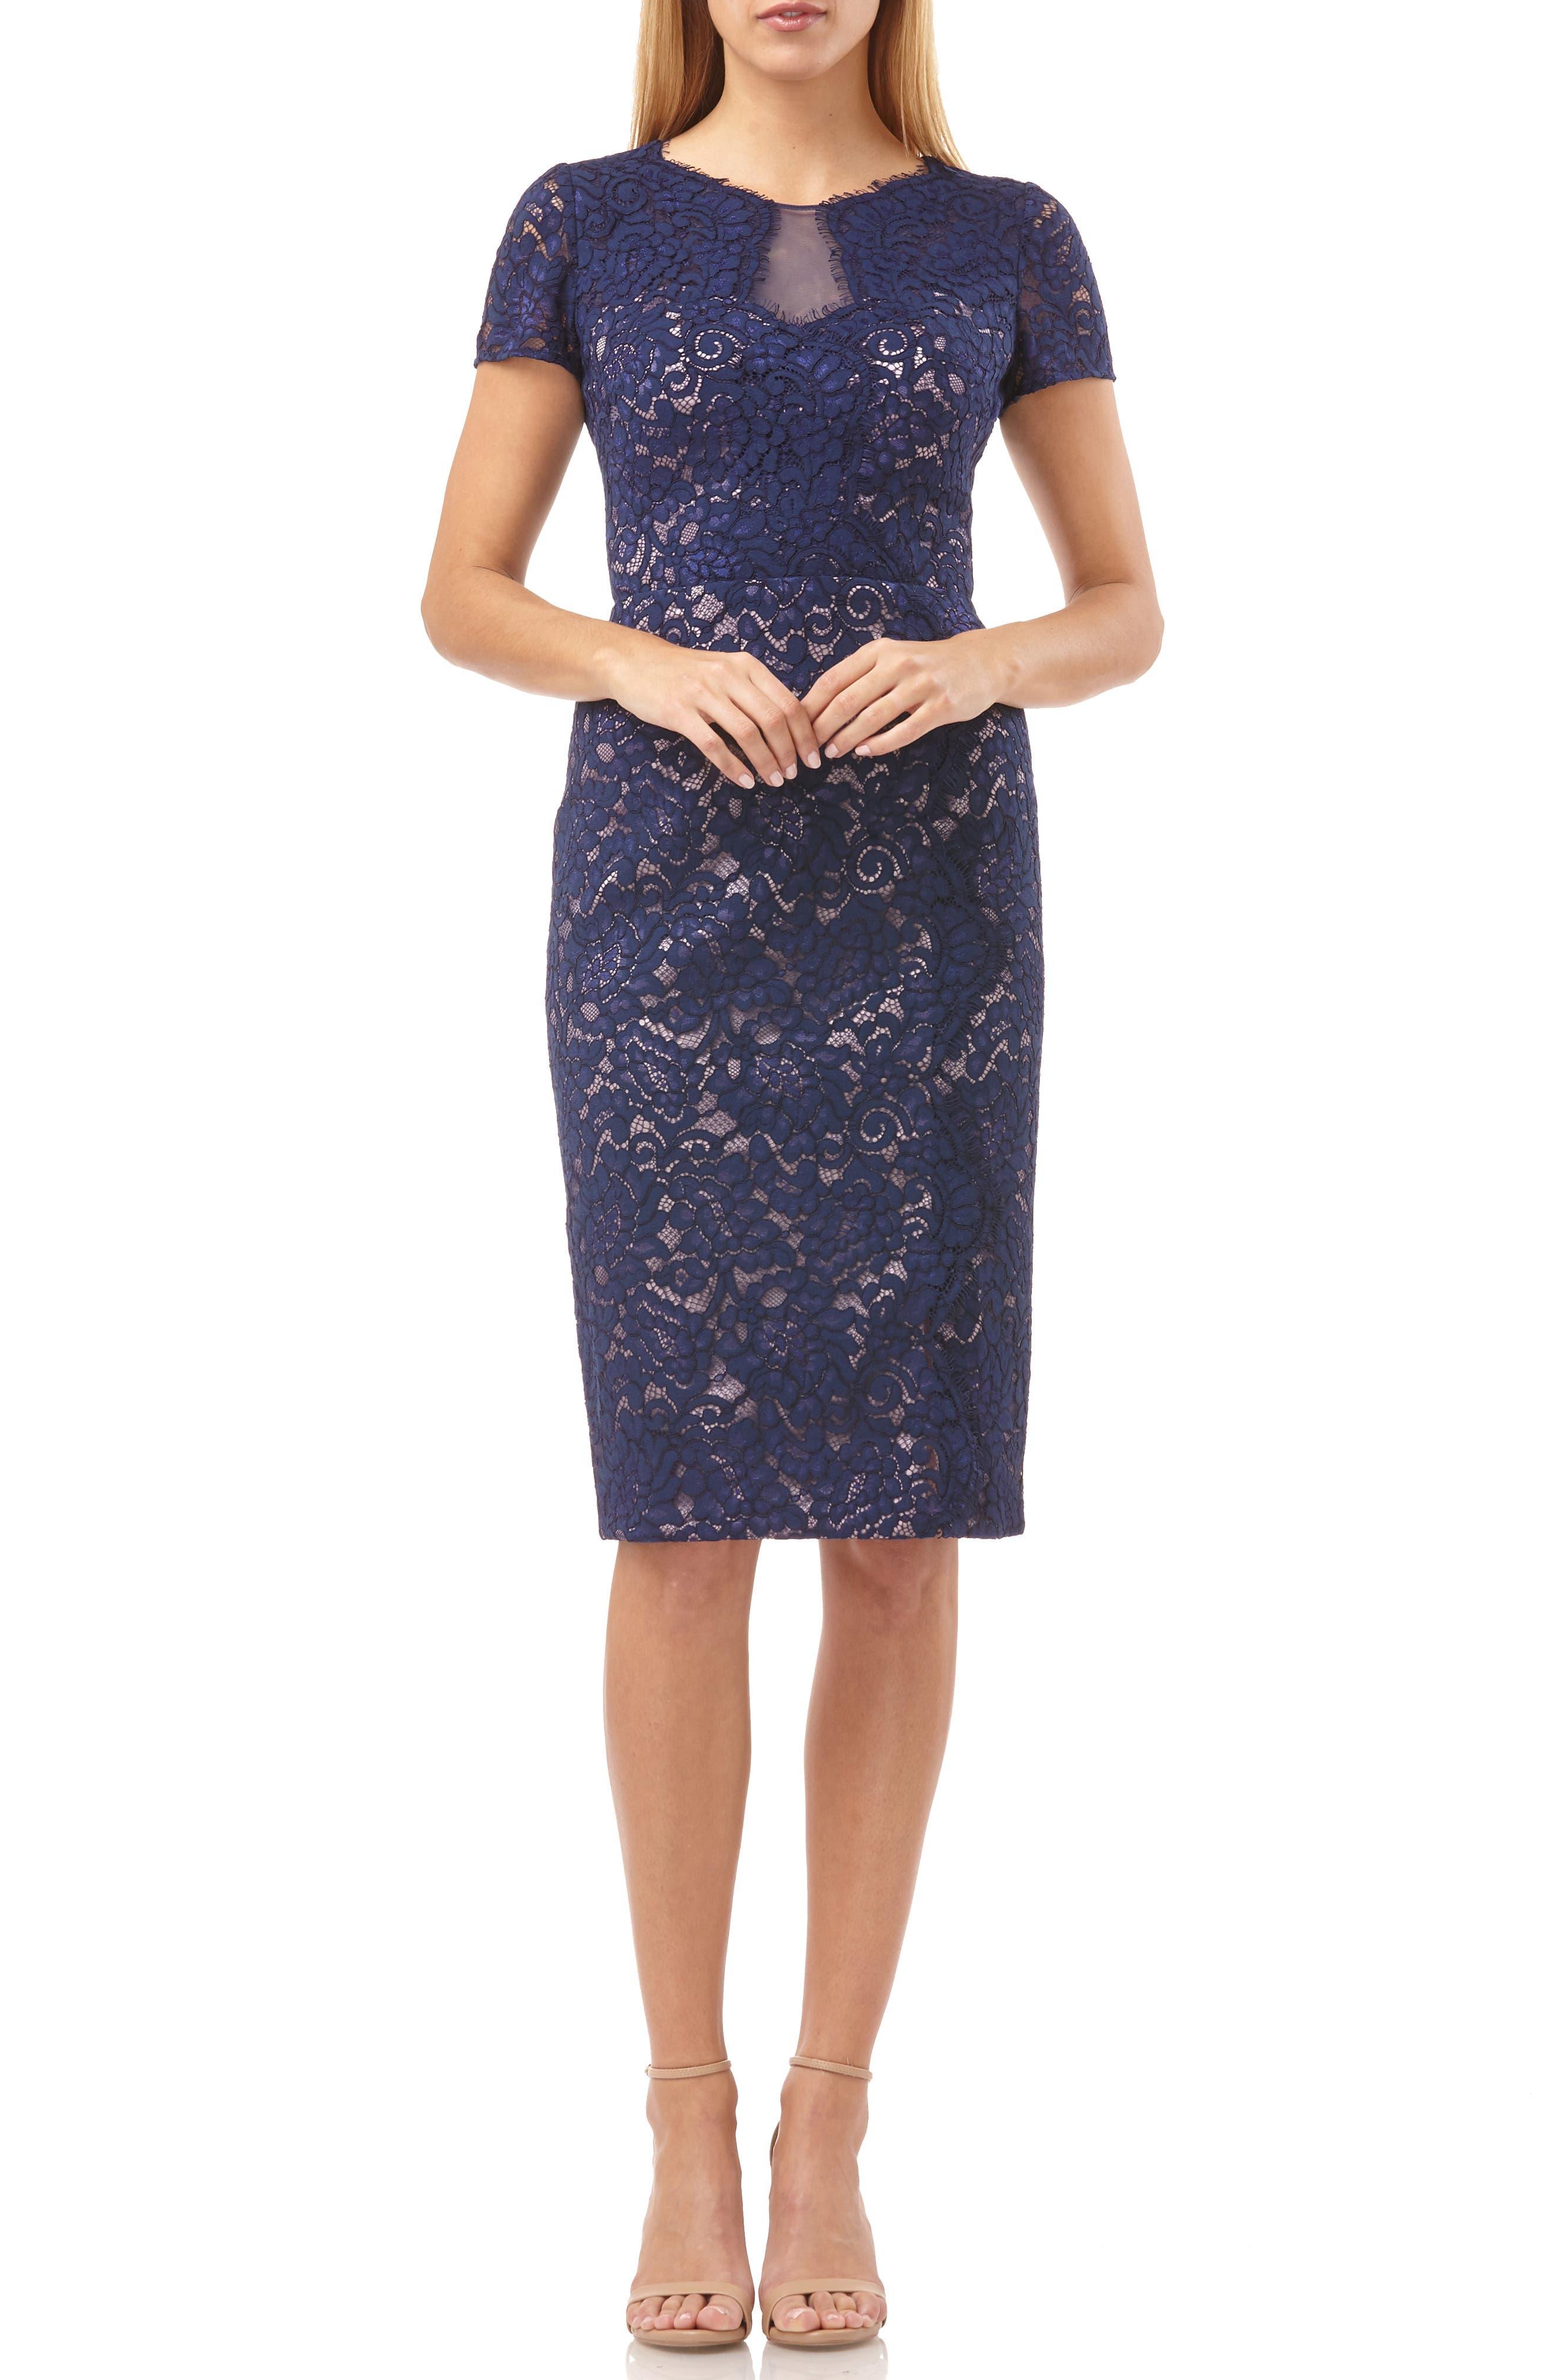 Js Collections Lace Cocktail Dress, Blue